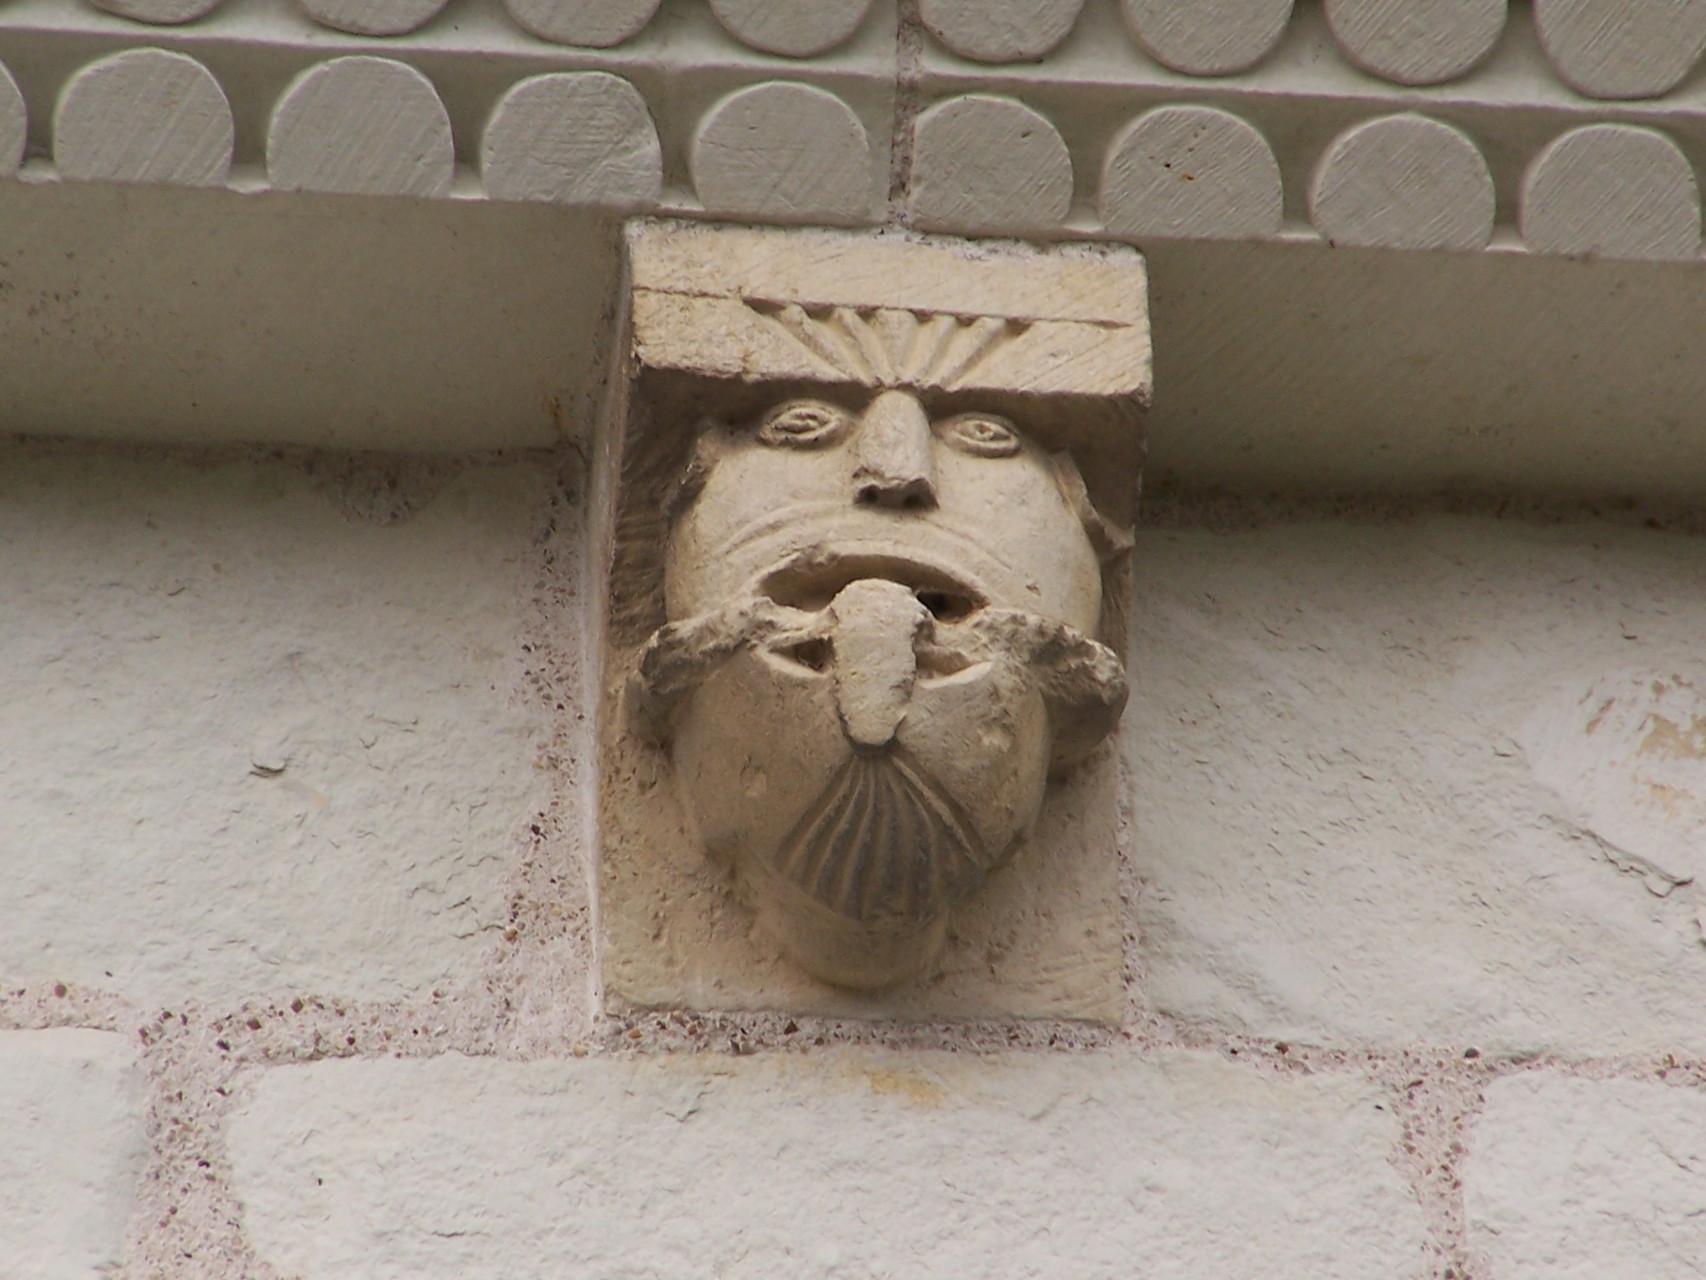 Corbeau sud - vieillard barbu tirant la langue